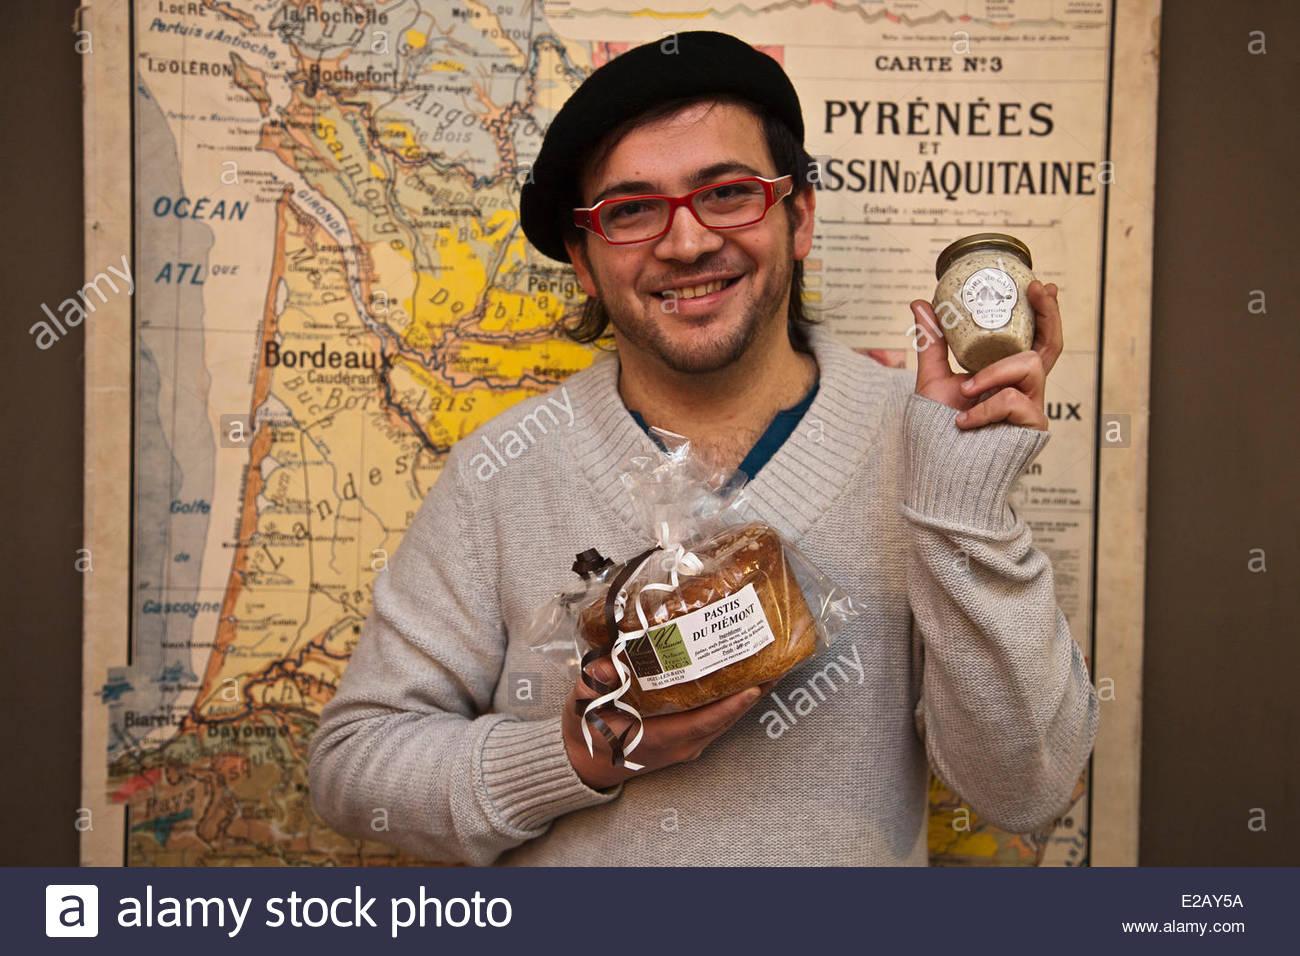 France, Pyrenees Atlantiques, Bearn, Pau, Bord de Gave Delicatessen, Bearnaise sauce produced in Bearn by Samuel - Stock Image